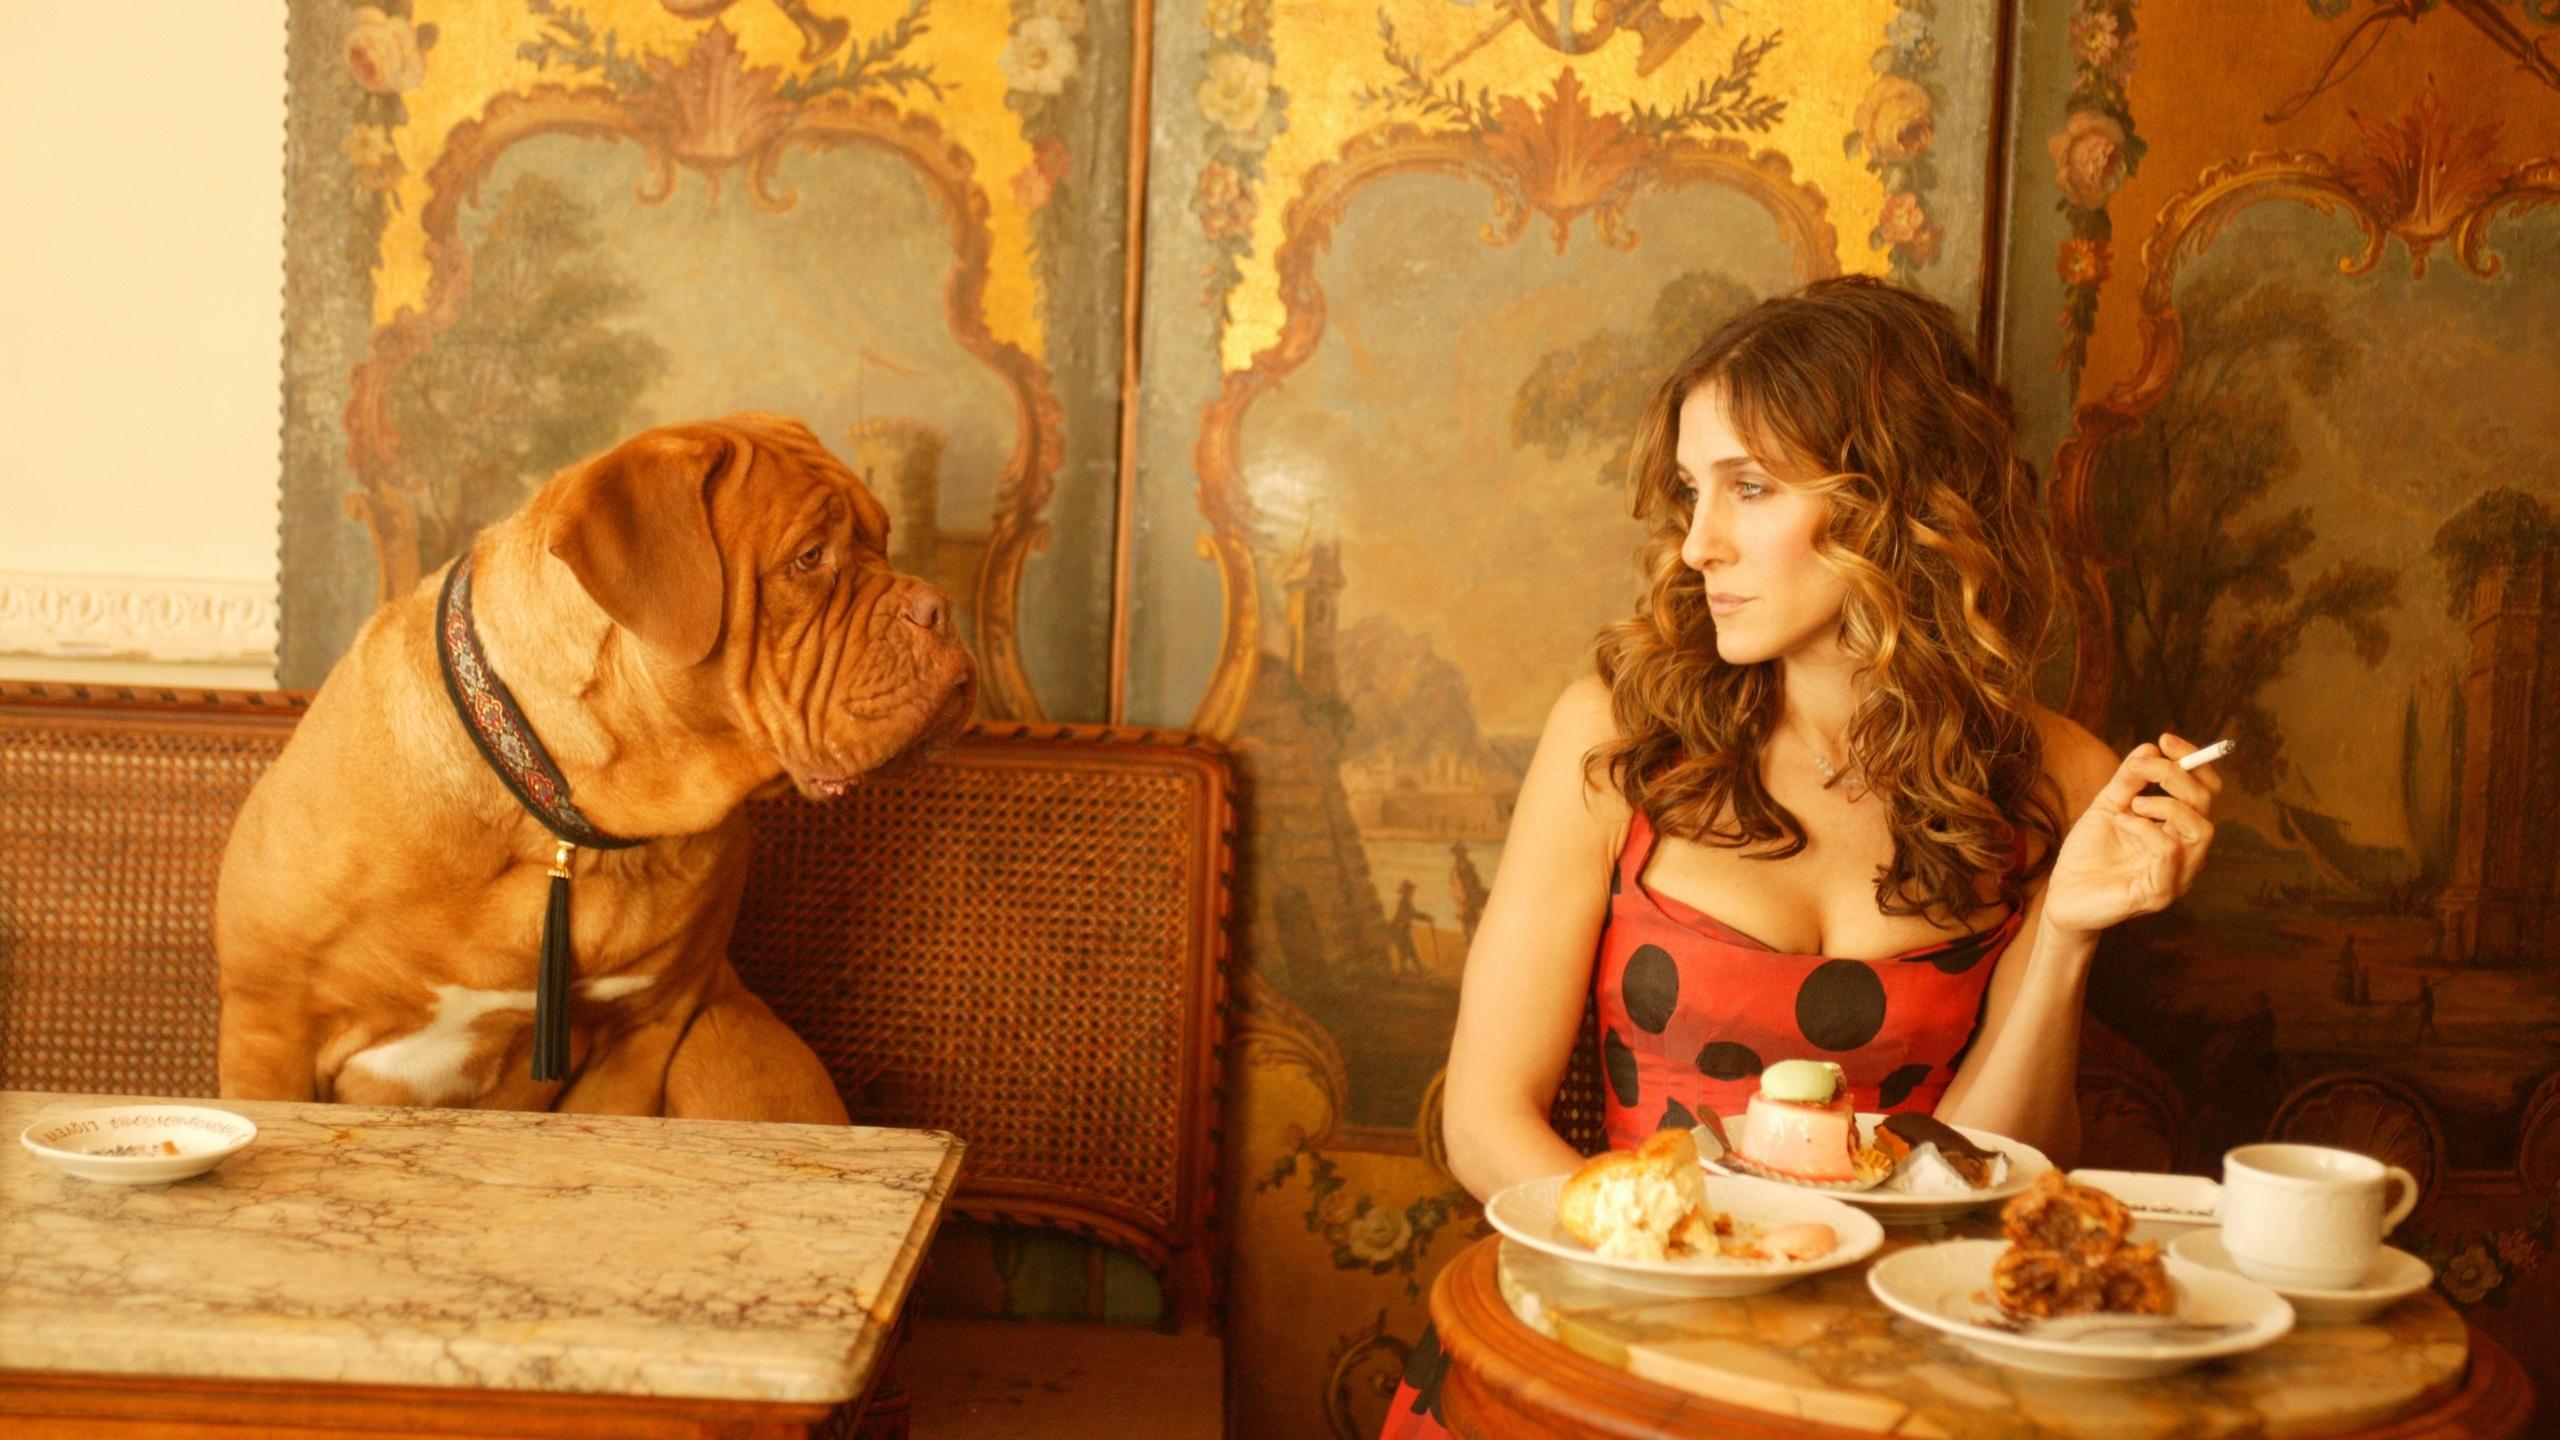 Sarah Jessica Parker, актриса, мастиф, женщина, собака, sex and the